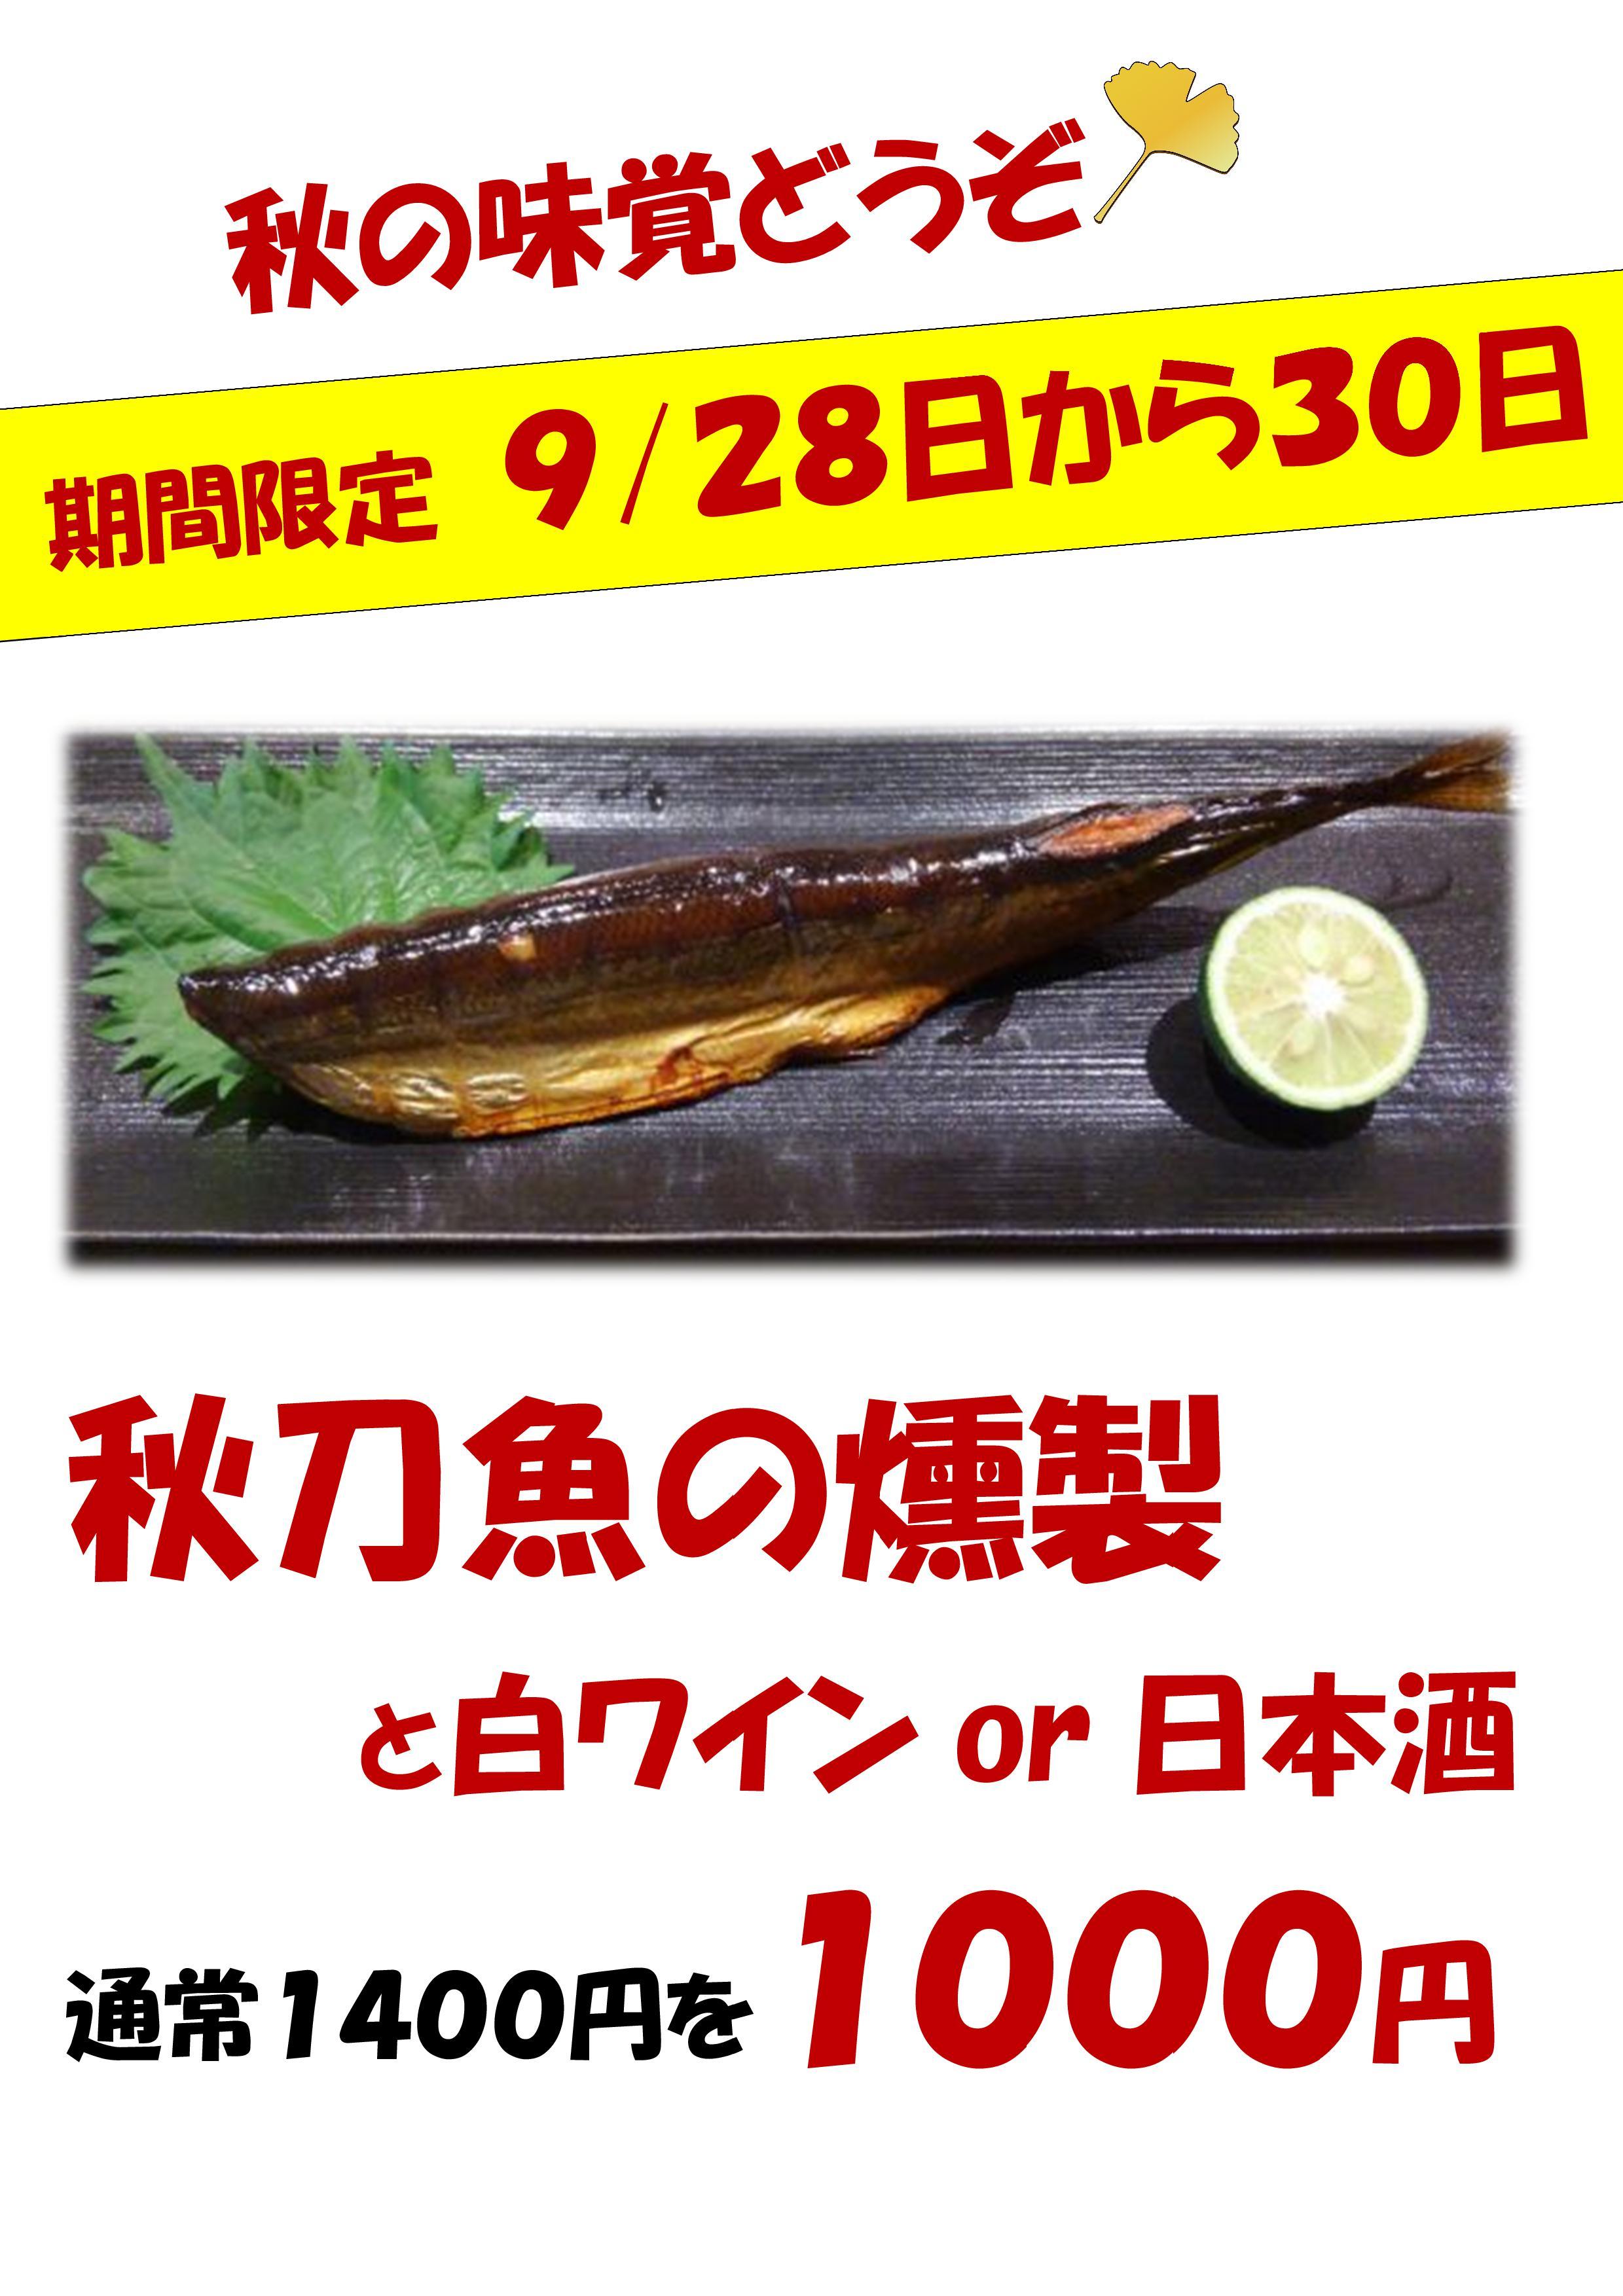 Microsoft Word - 秋刀魚の燻製